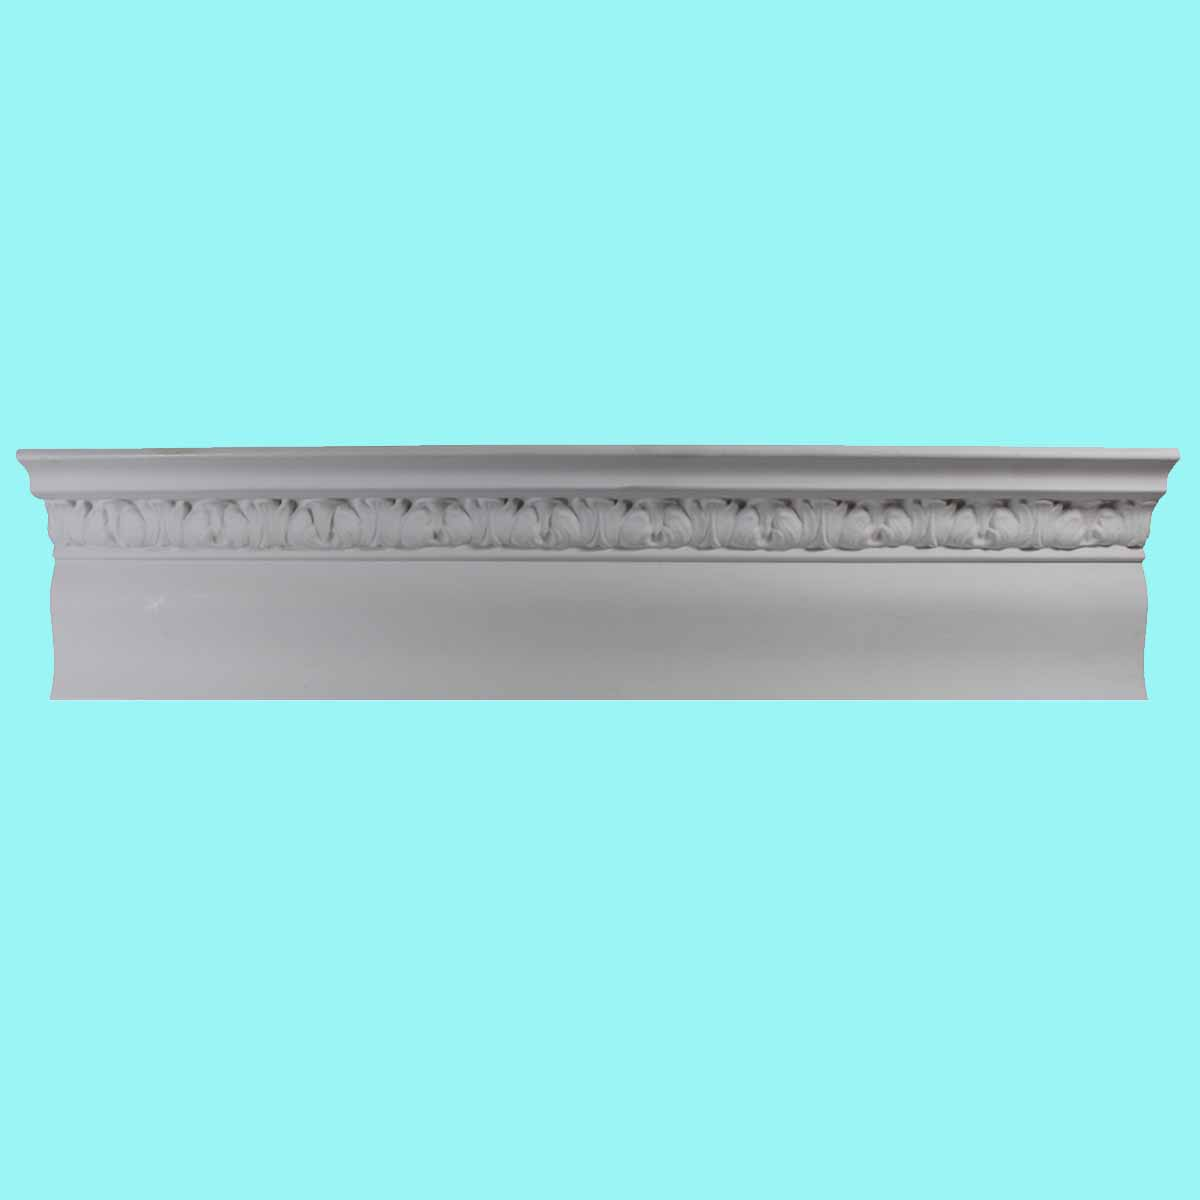 Cornice White Urethane Sample of 12401 24 Cornice Cornice Moulding Cornice Molding